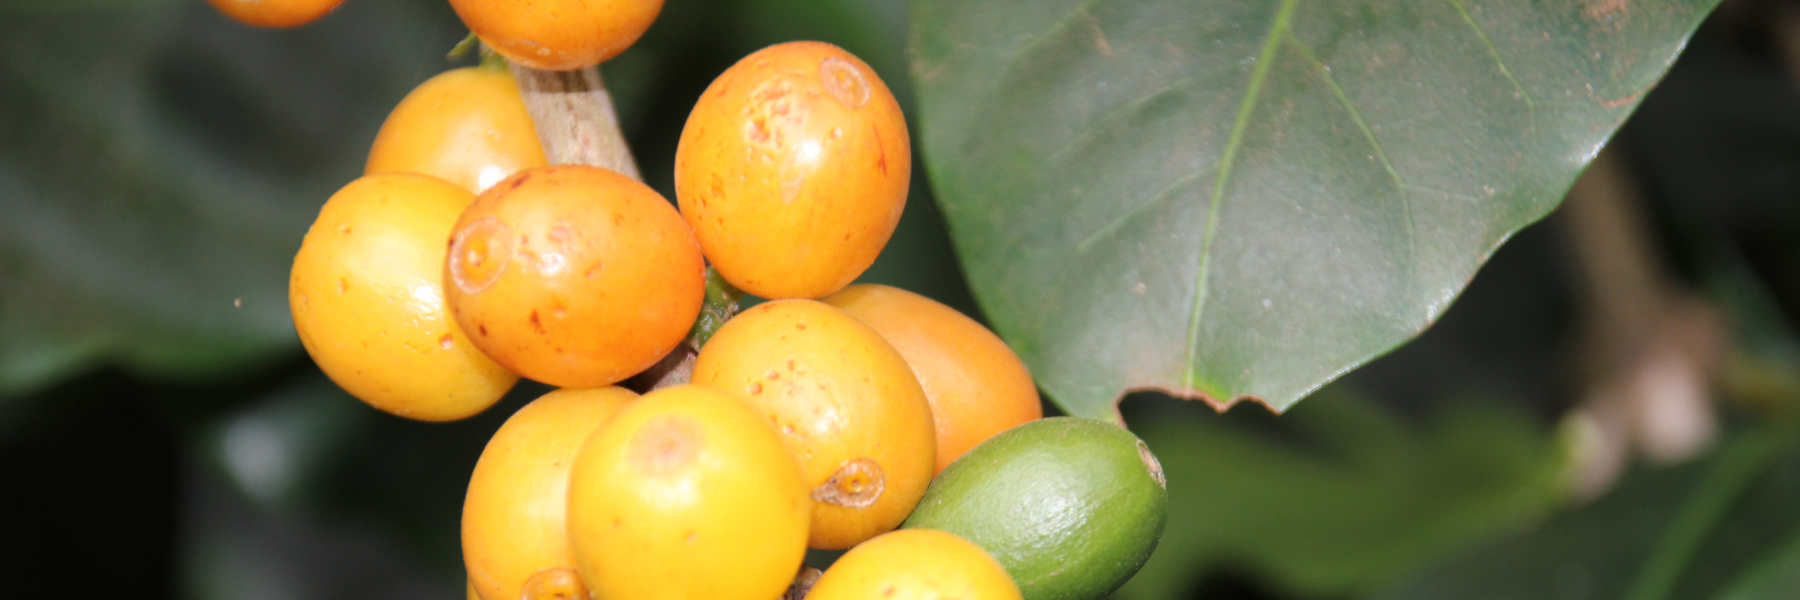 Variatät Yellow Catuai auf der Finca Capim Branco in Brasilien